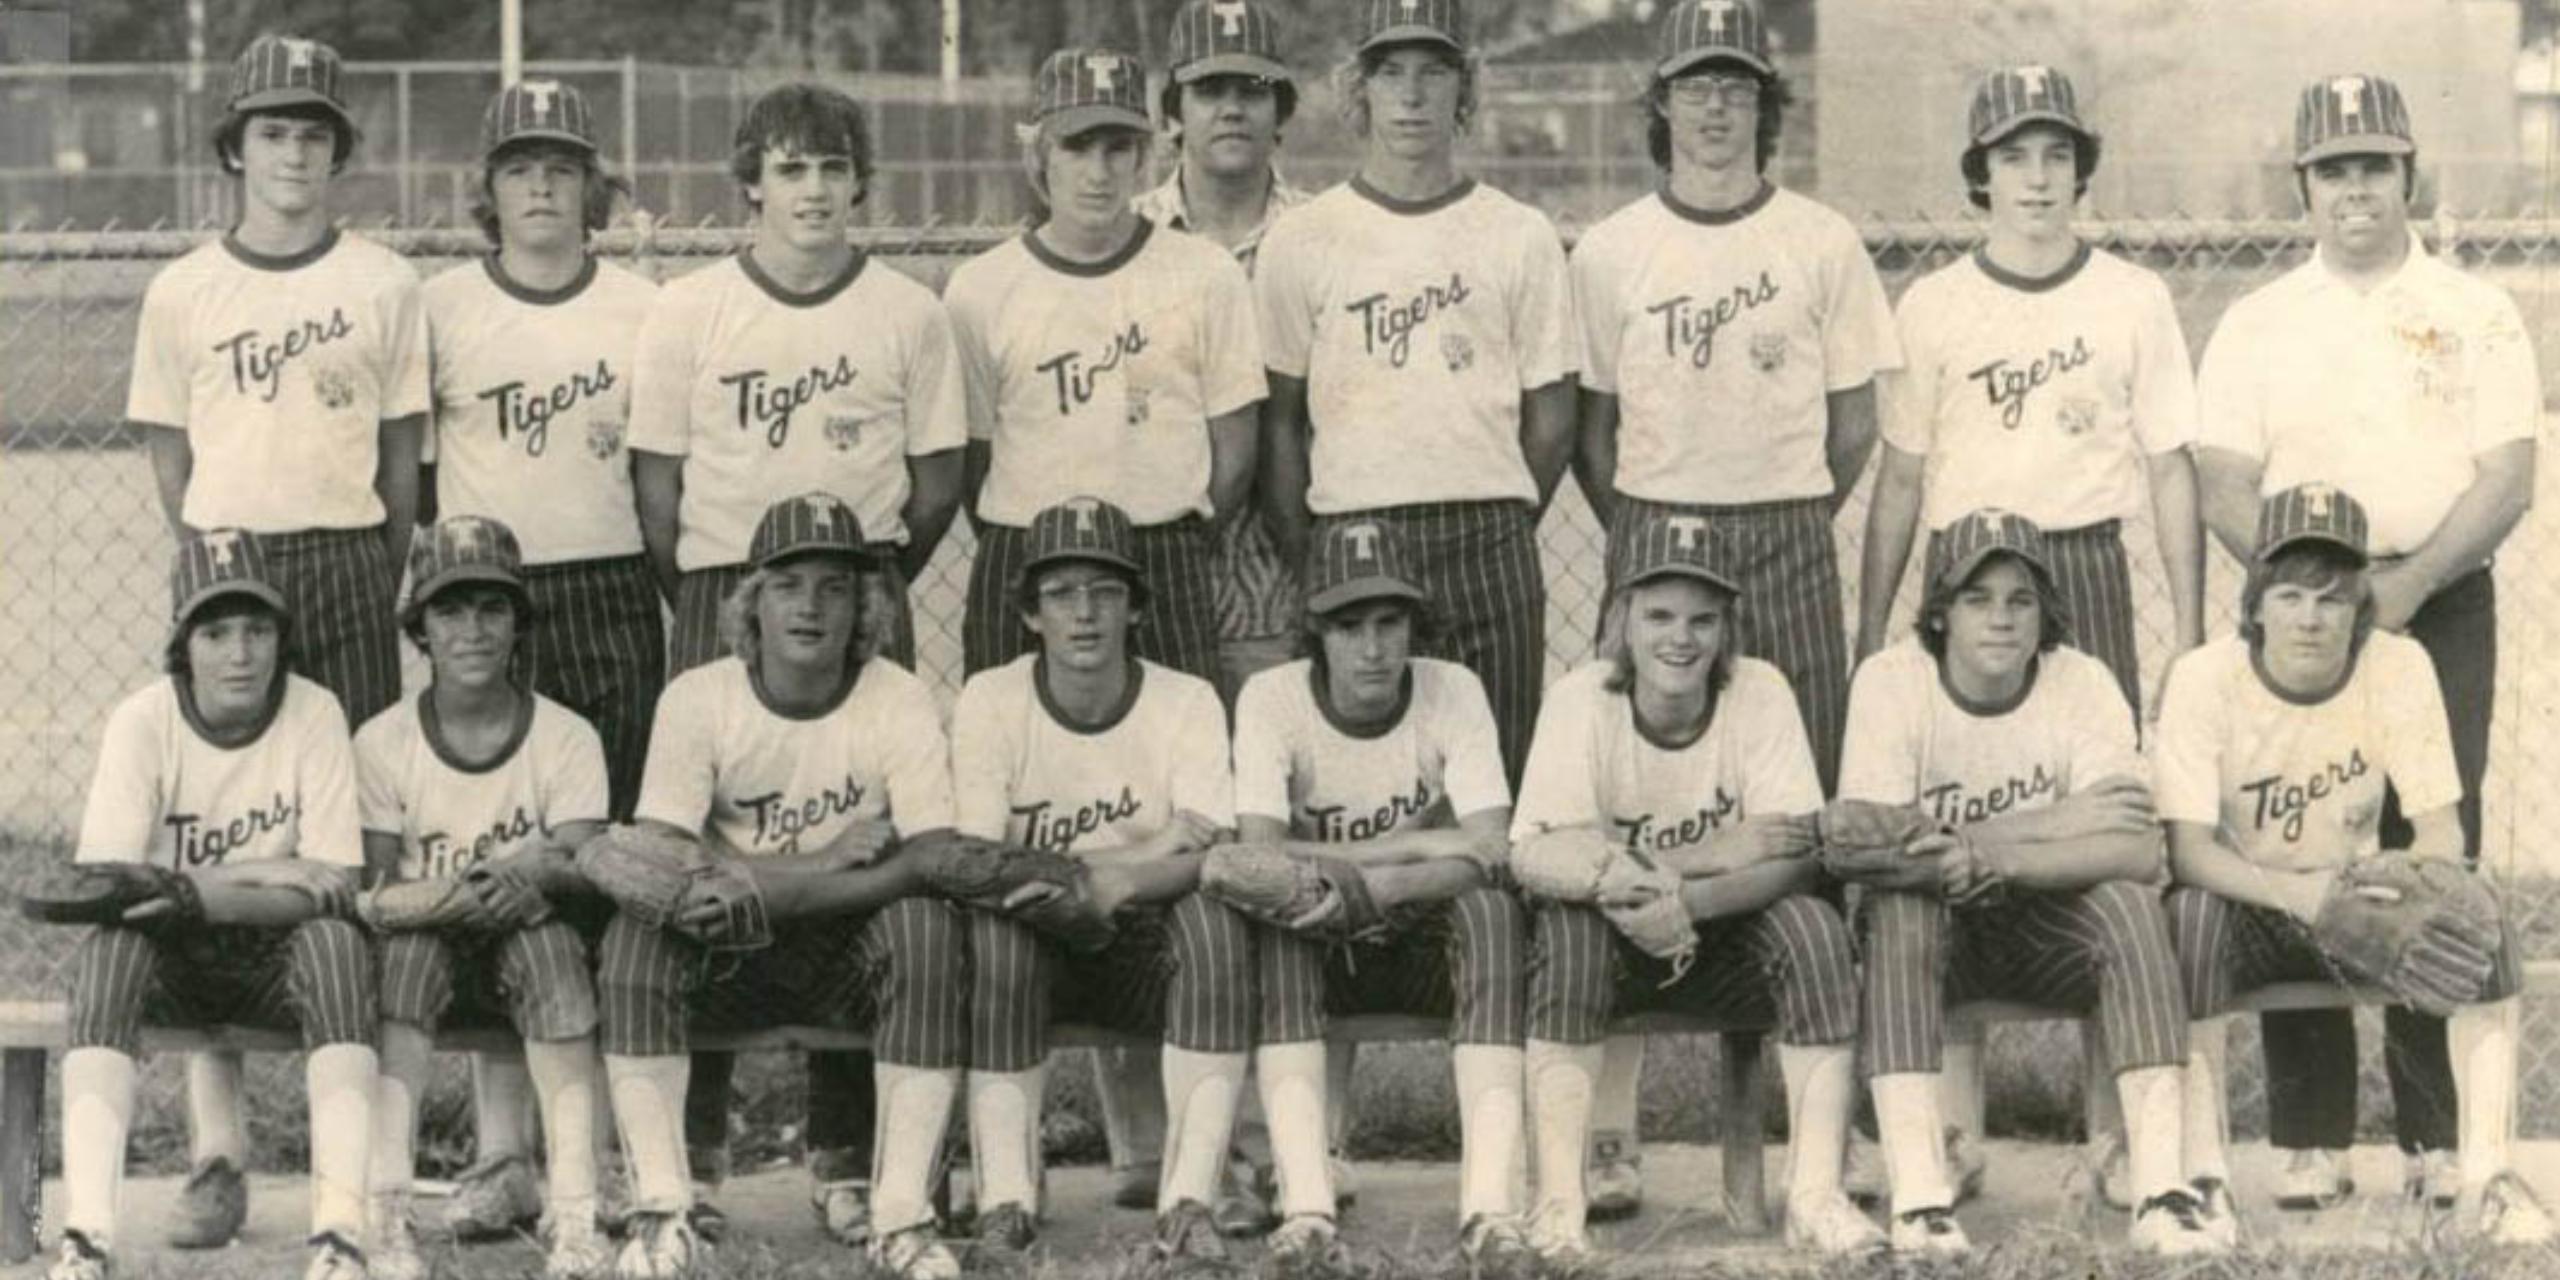 Memphis Tigers baseball team